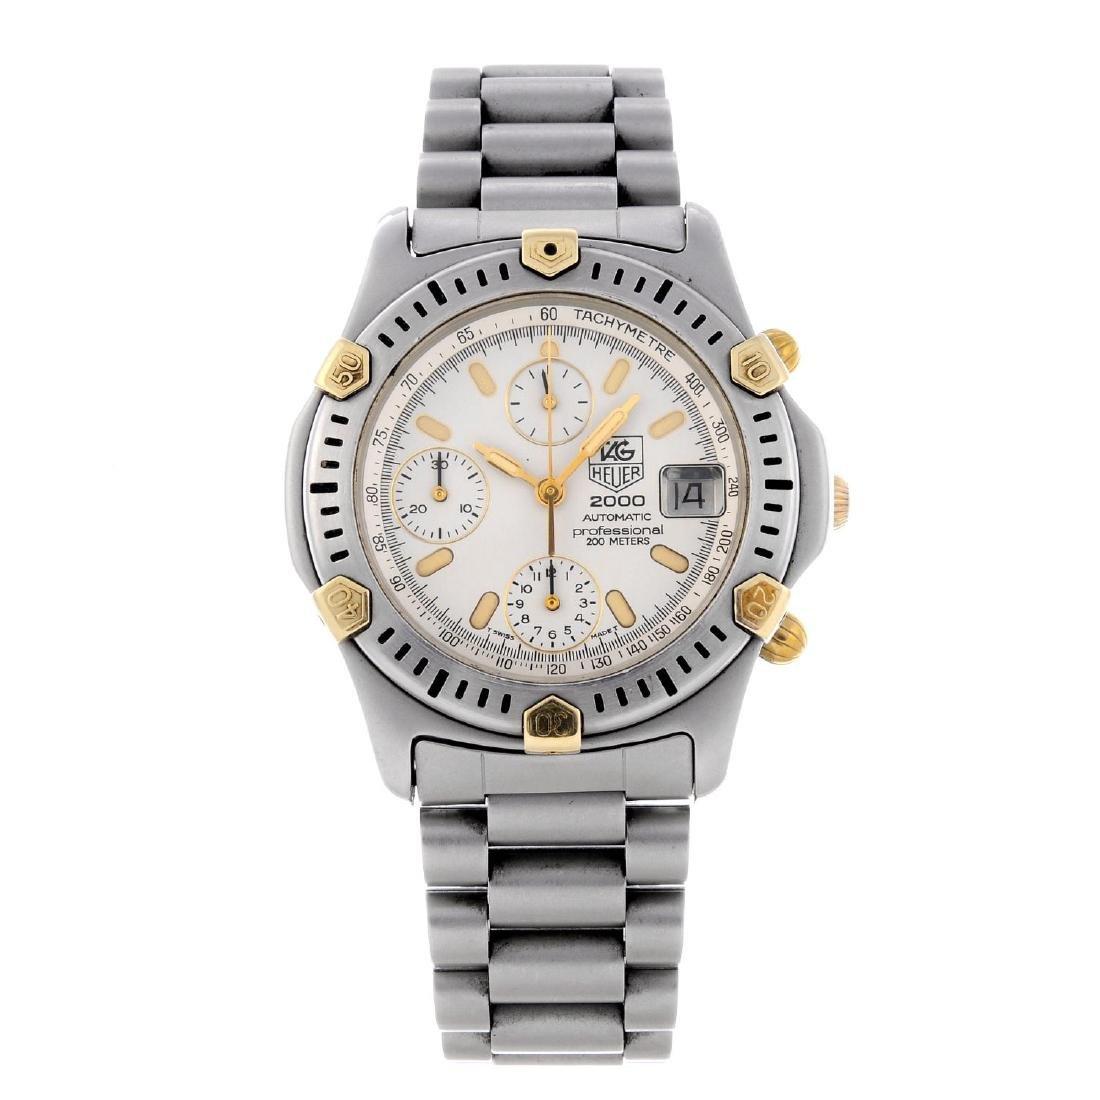 TAG HEUER - a gentleman's 2000 Series chronograph